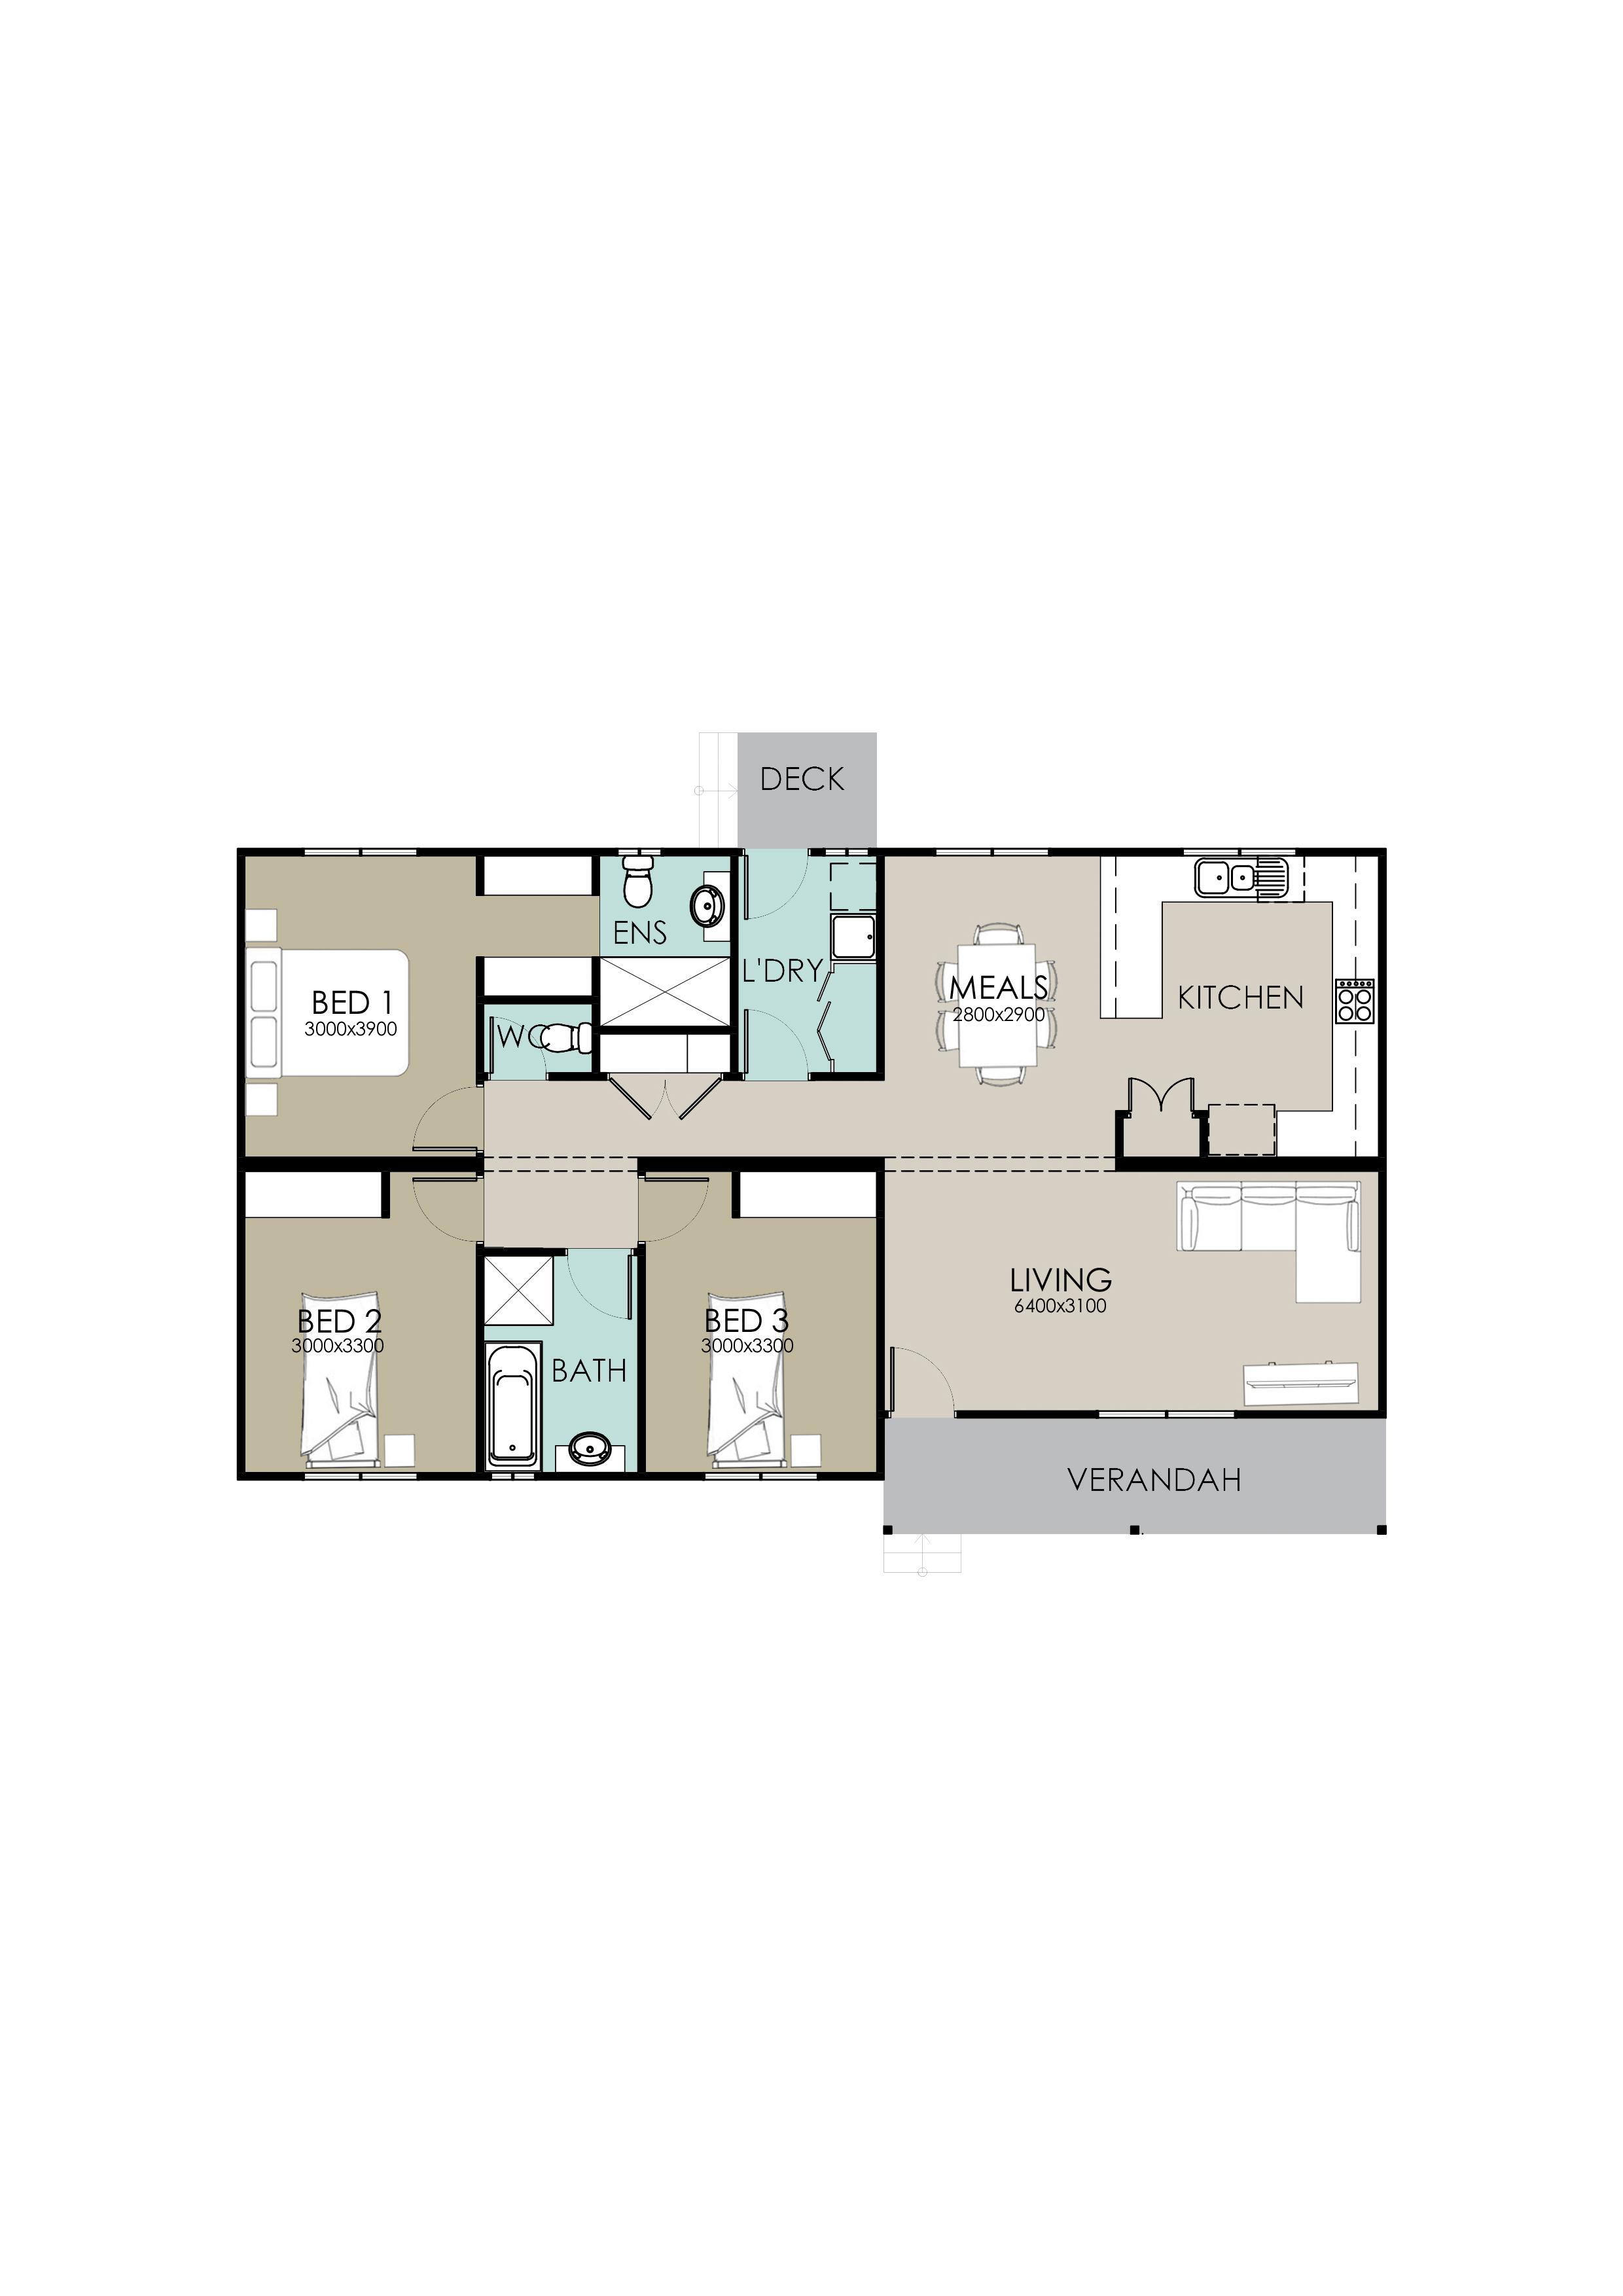 18m Lot Frontage 3 Bedroom Home Plans Richard Adams Homes